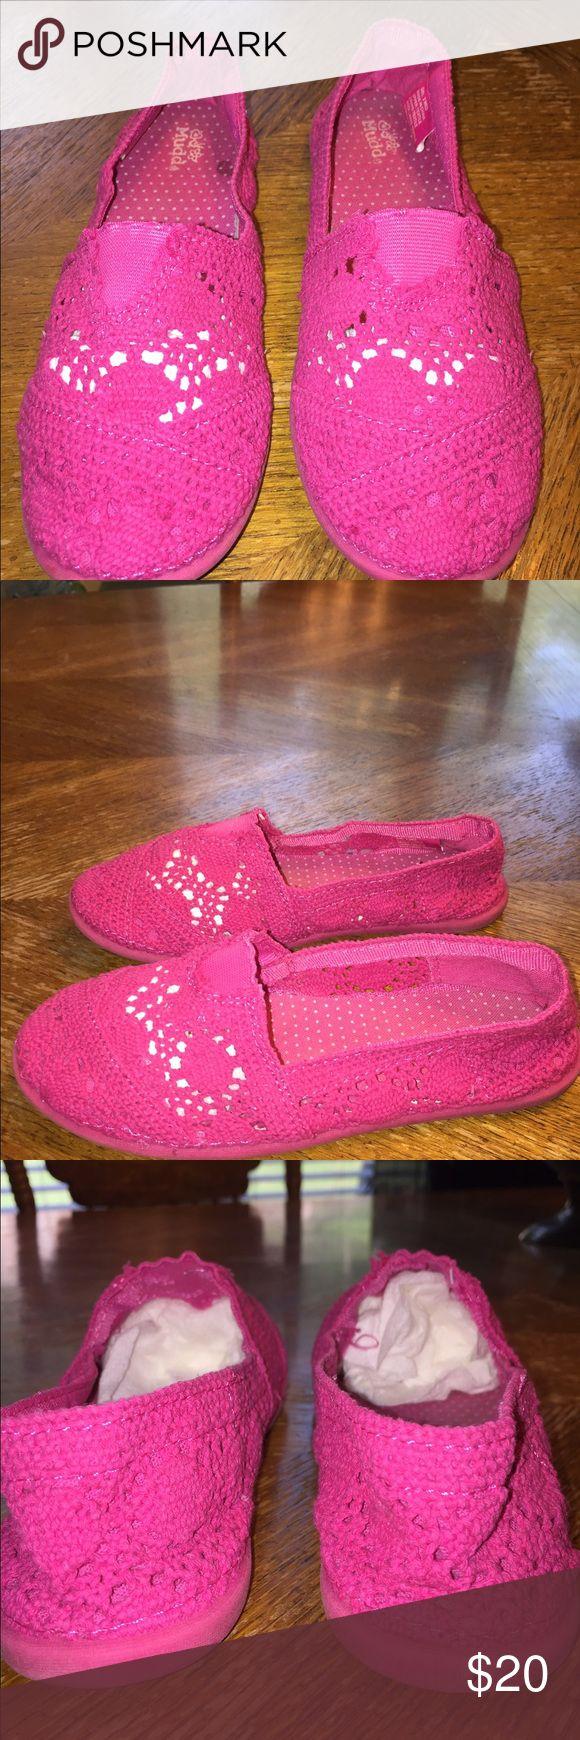 Mudd Hot Pink Toms Look Crochet Slip Ons Size 2   Mudd Hot Pink , Toms Look,  Crochet Slip Ons Mudd Shoes Sandals & Flip Flops